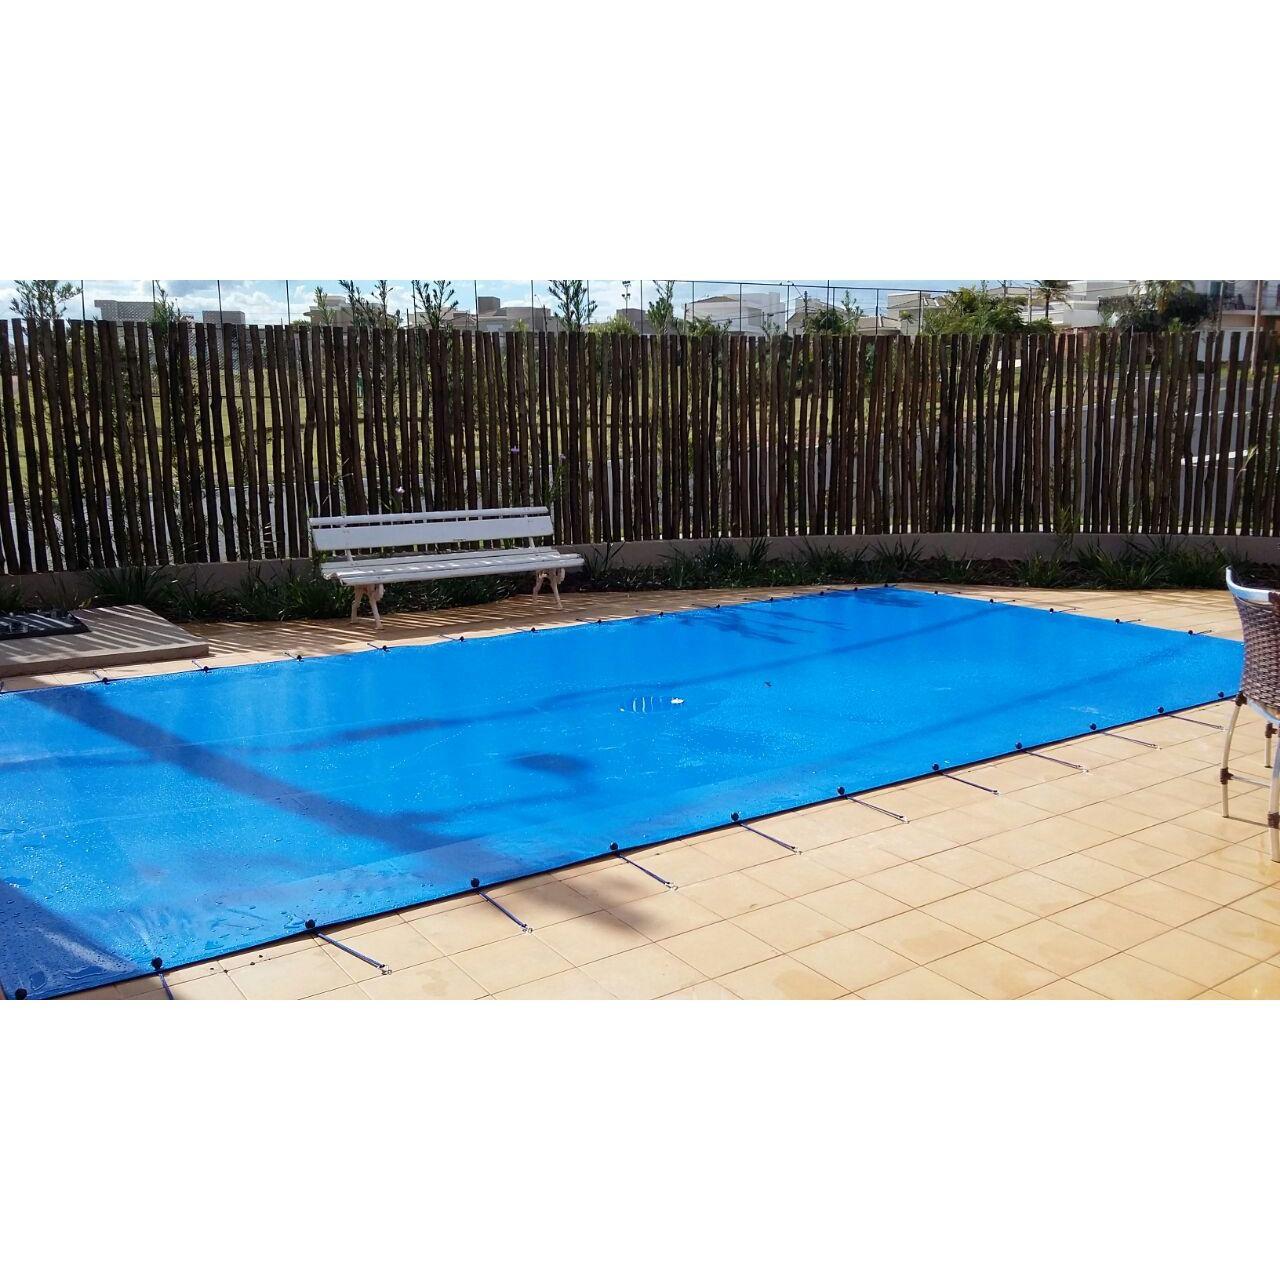 Lona Polietileno Azul 300 Micras - 6,5x4,5